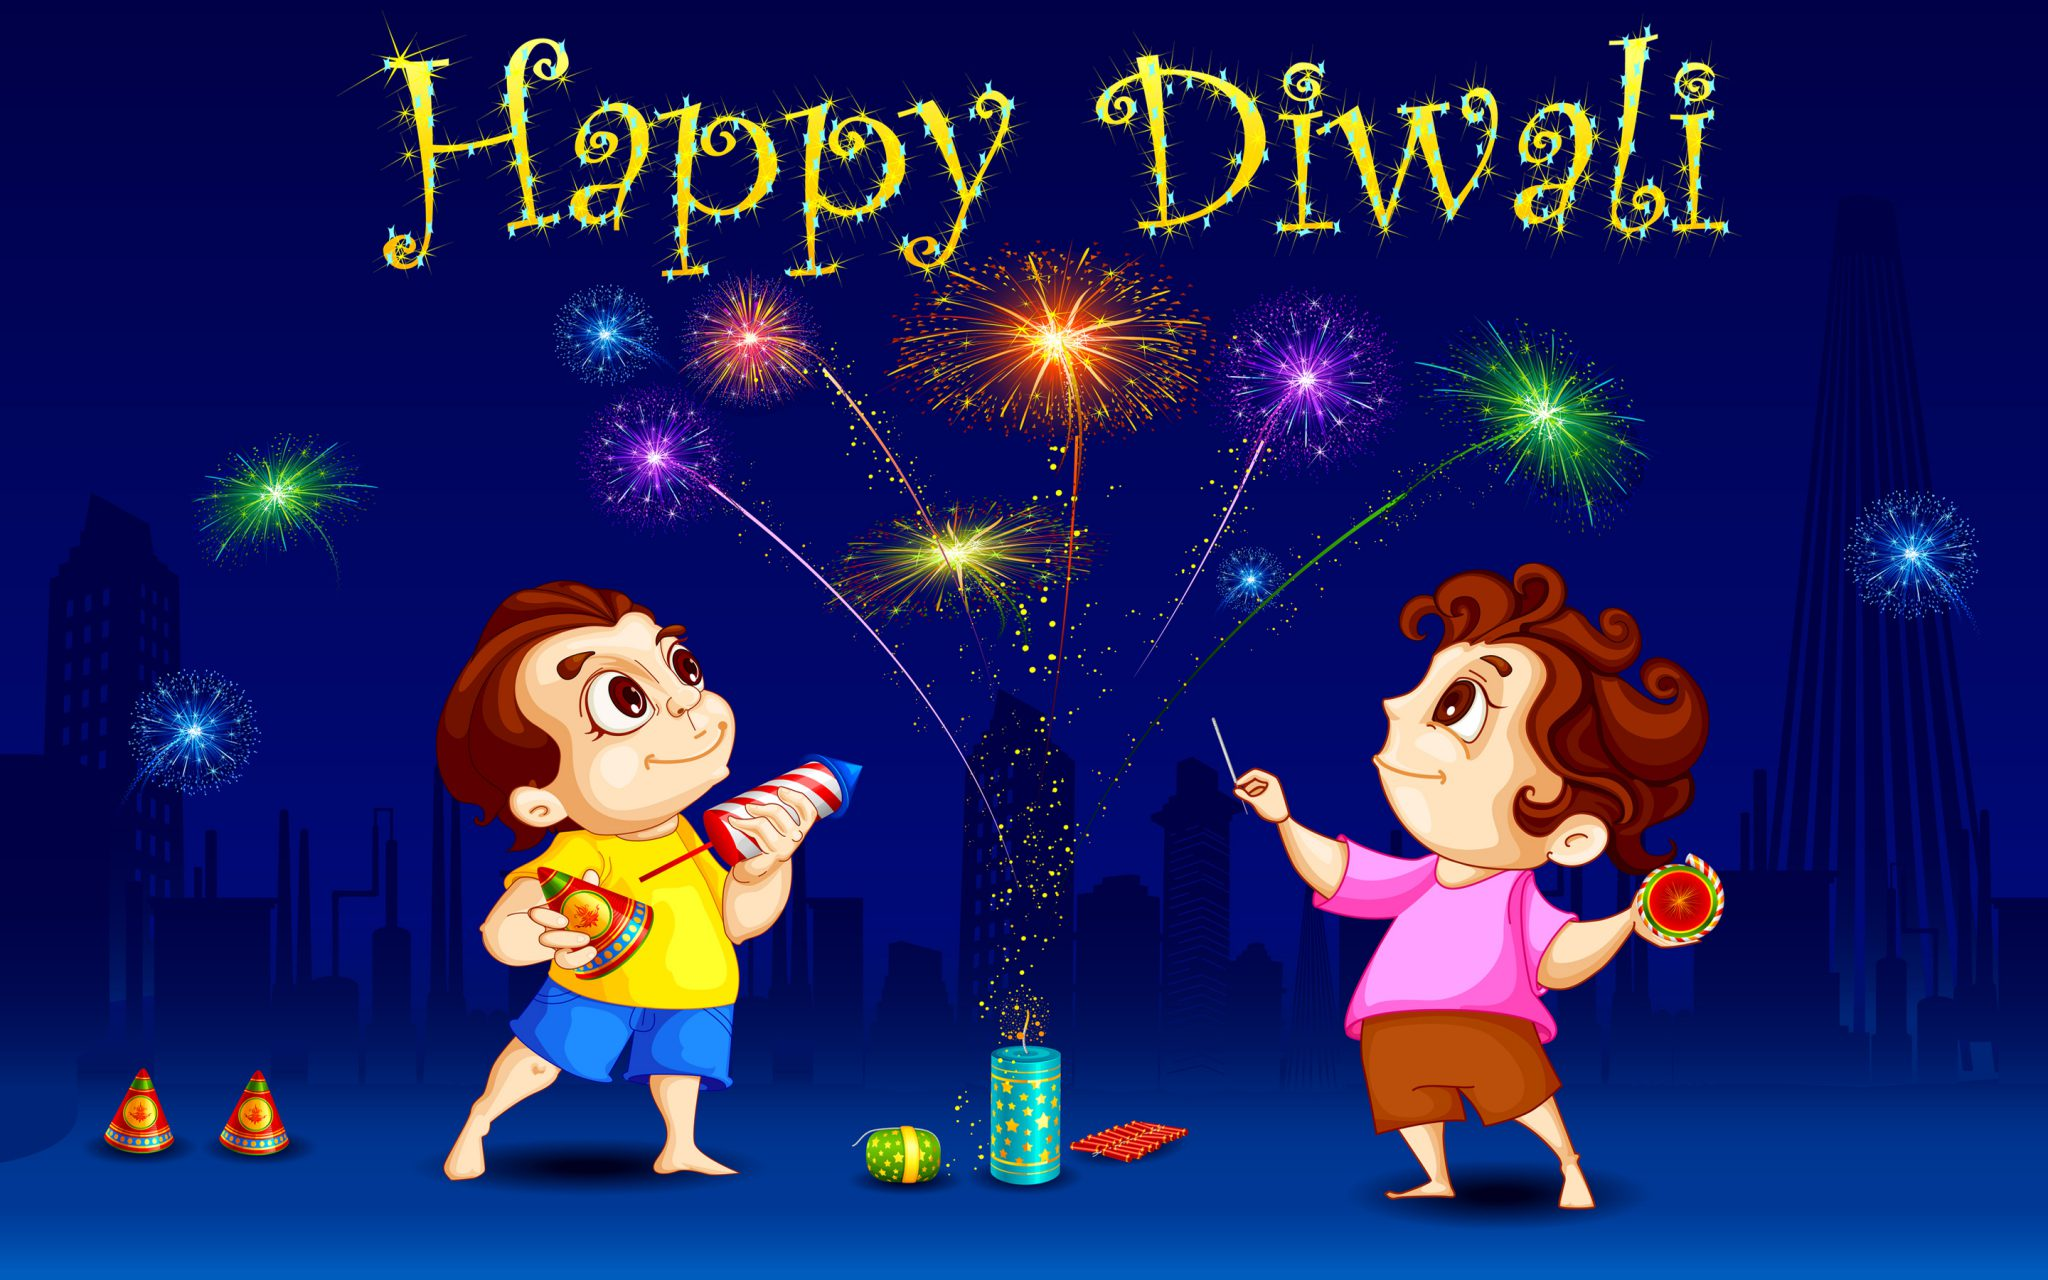 Choti Diwali Wallpapers